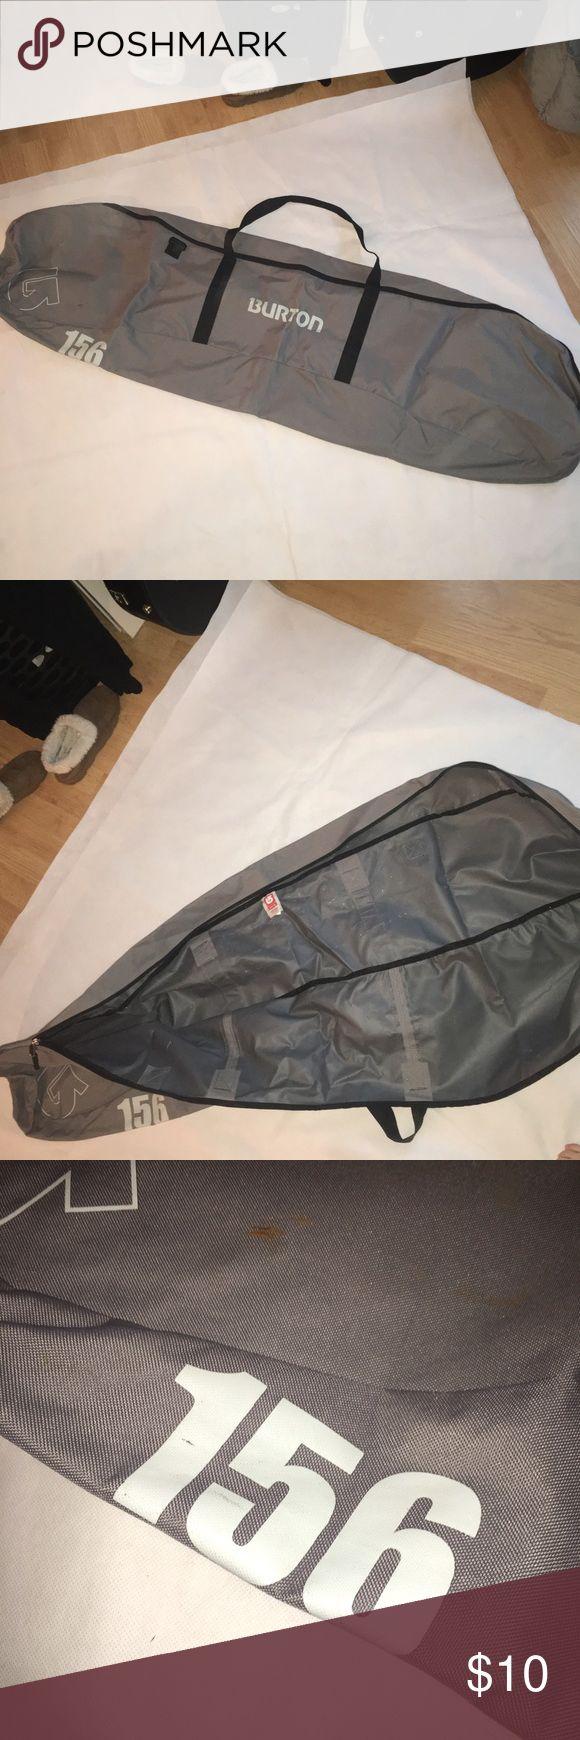 Burton snowboard bag Burton snowboard bag. Couple stains. No strap. Size 156 Burton Bags